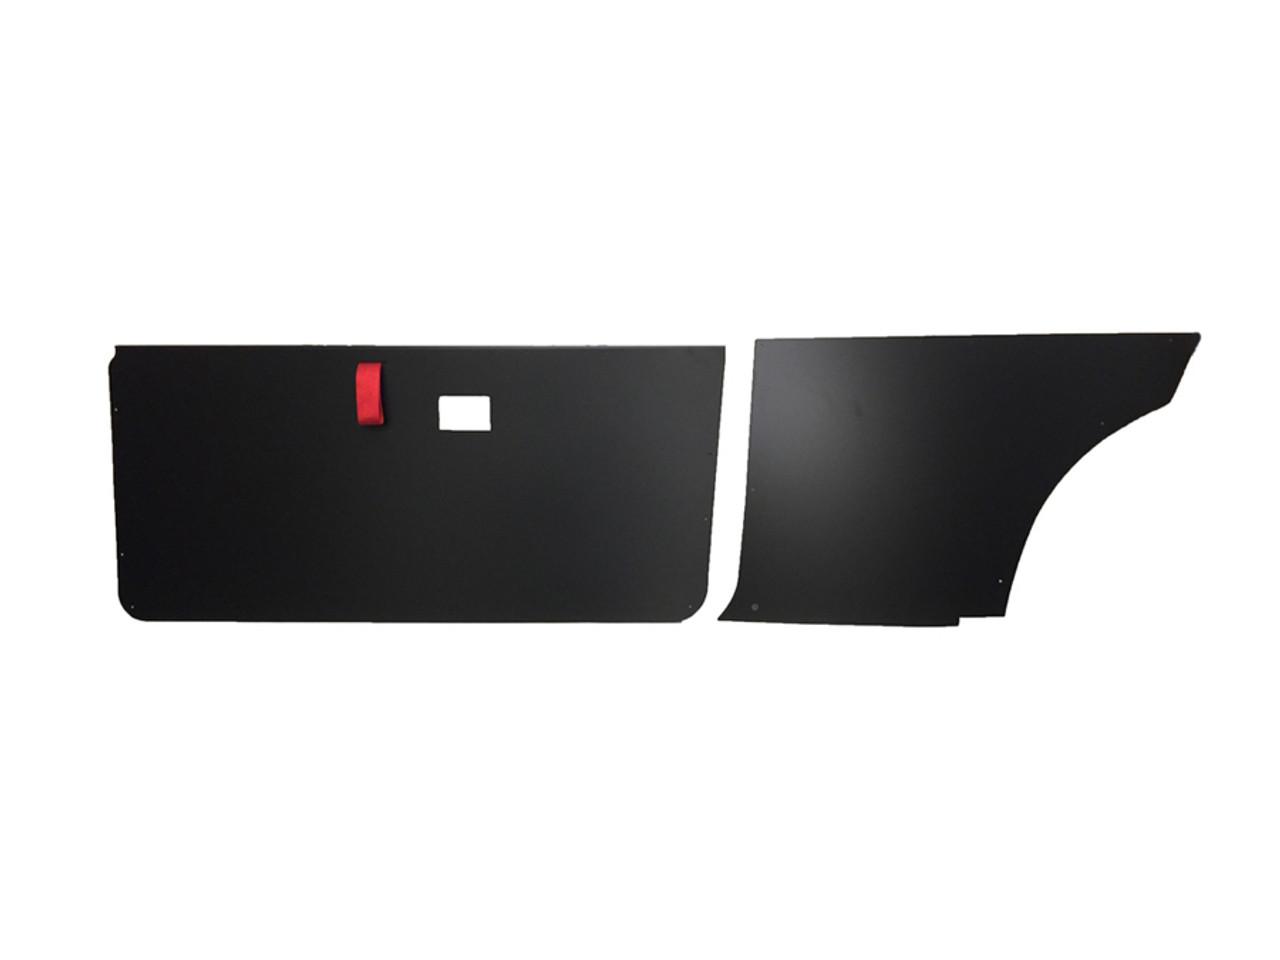 E30 V3 Coupe Door Rear Quarters Panels Set Of 4 Mkah